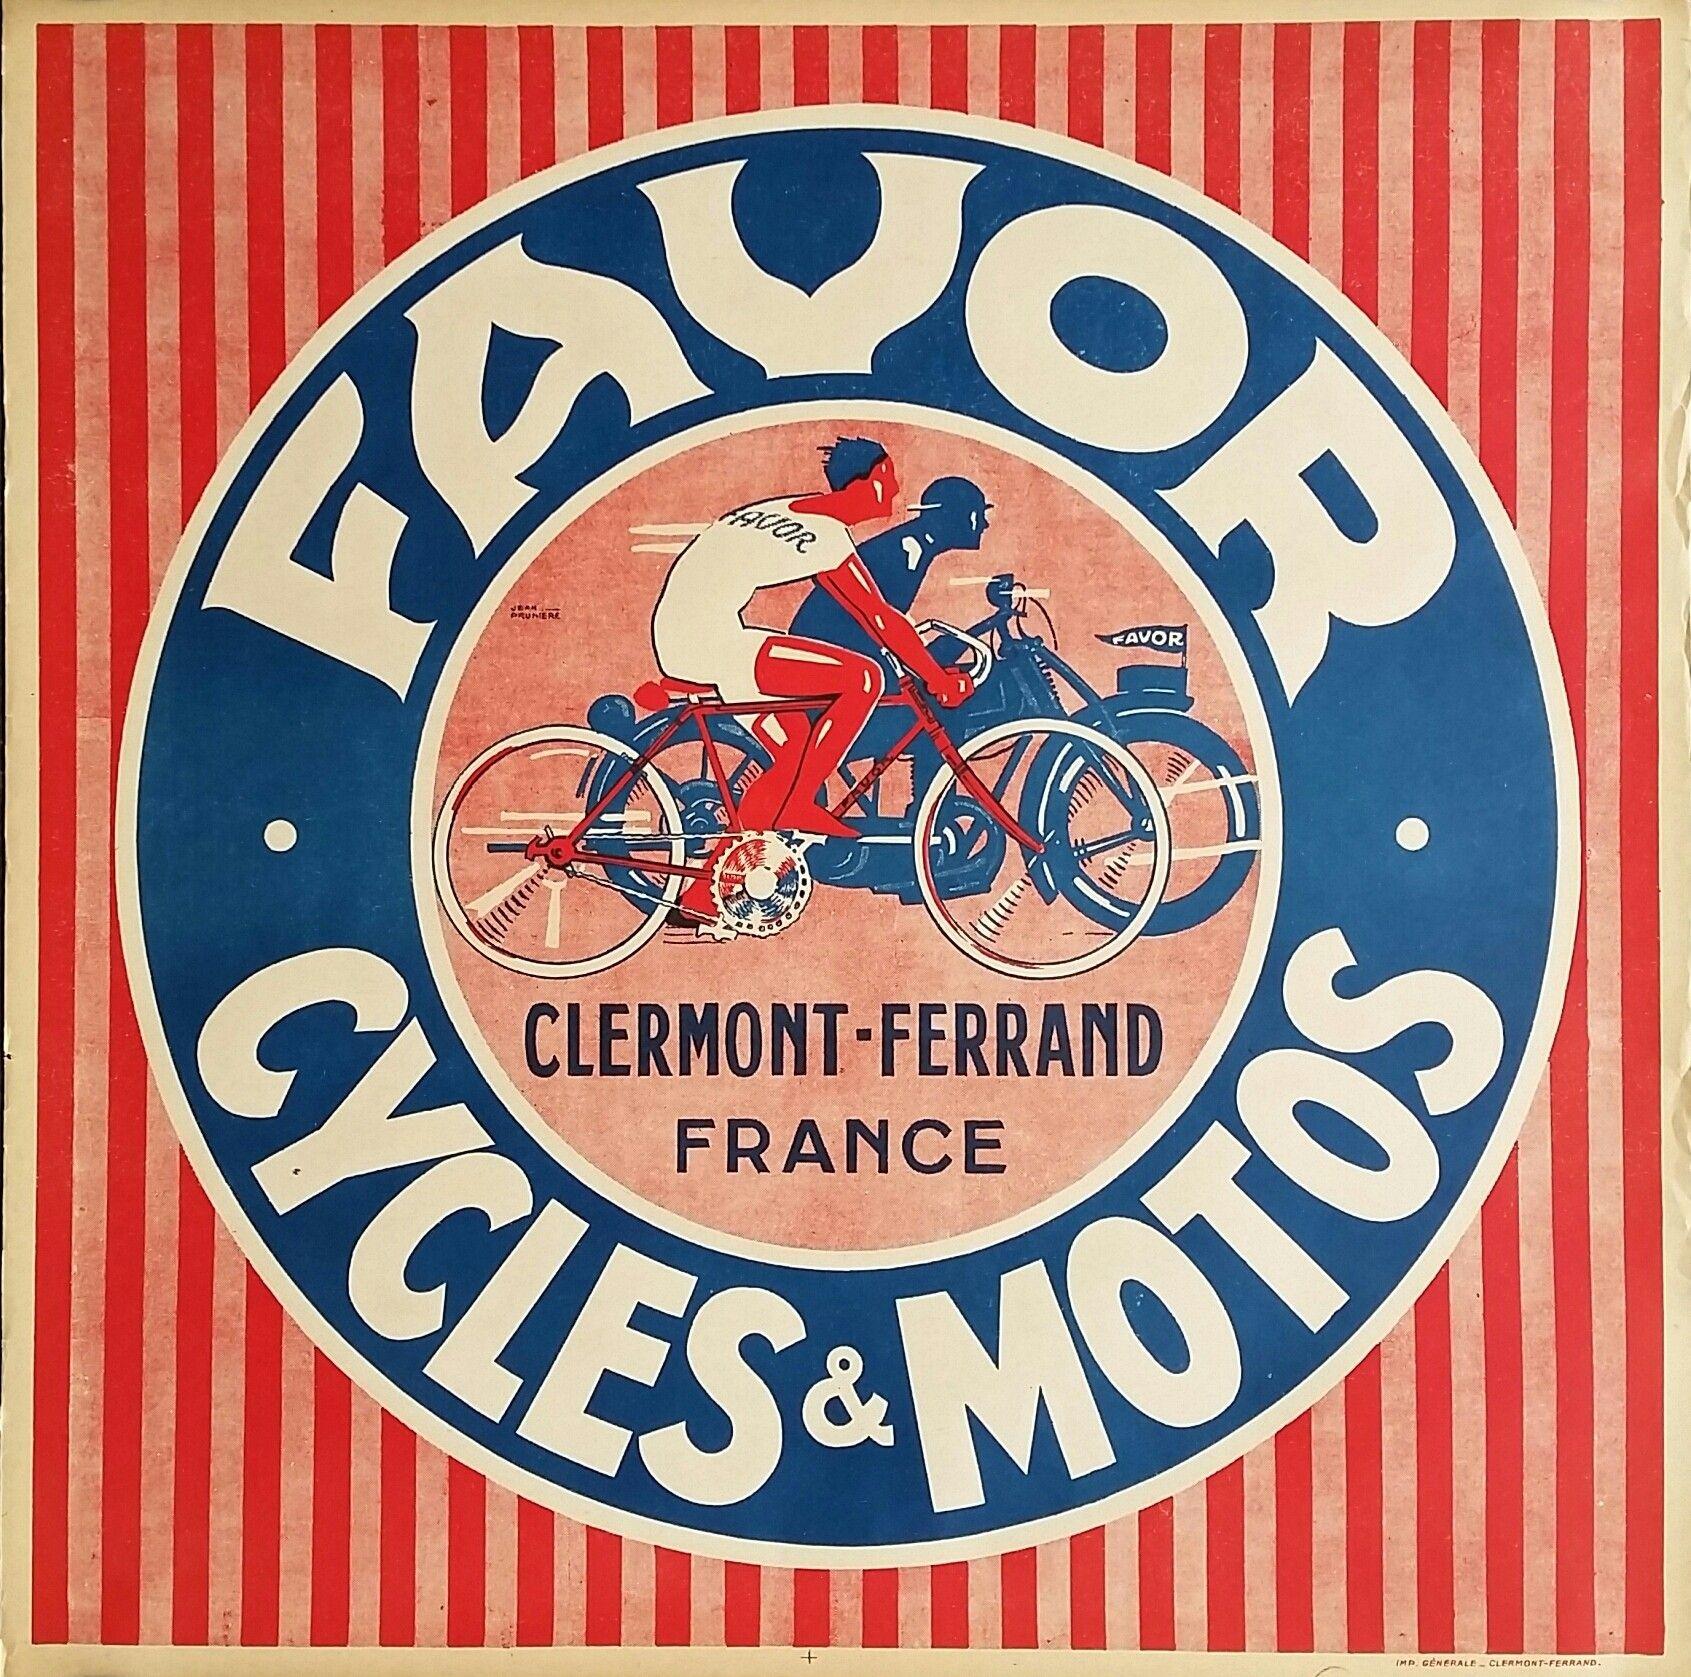 Original Vintage Motorcycle Poster Favor Cycles Et Motos Clermont Ferrand Jean Pruniere Motorcycle Posters Vintage French Posters Vintage Advertising Posters